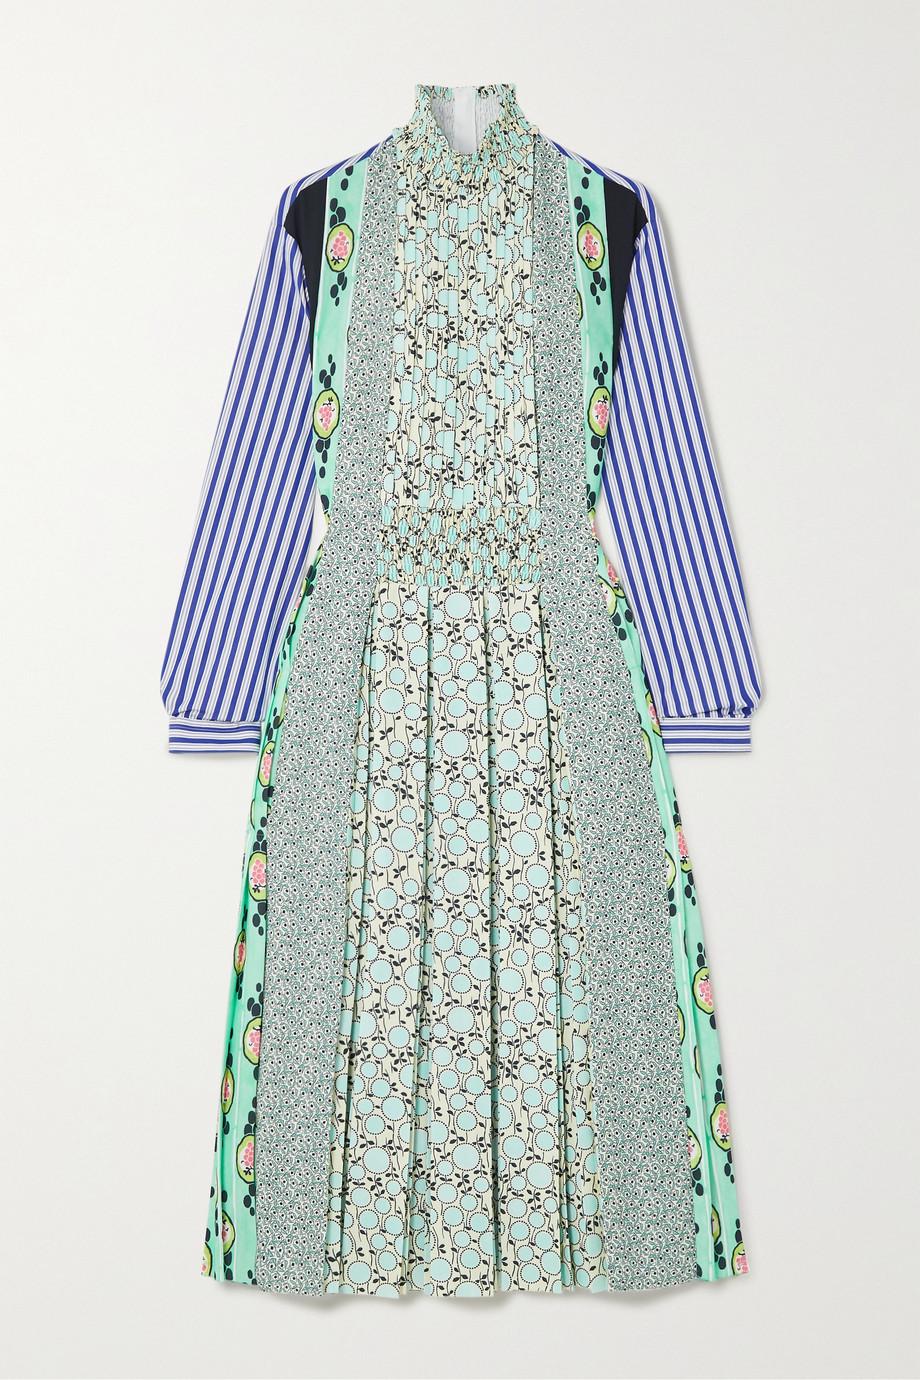 Prada Pintucked pleated printed cotton-poplin and crepe de chine midi dress